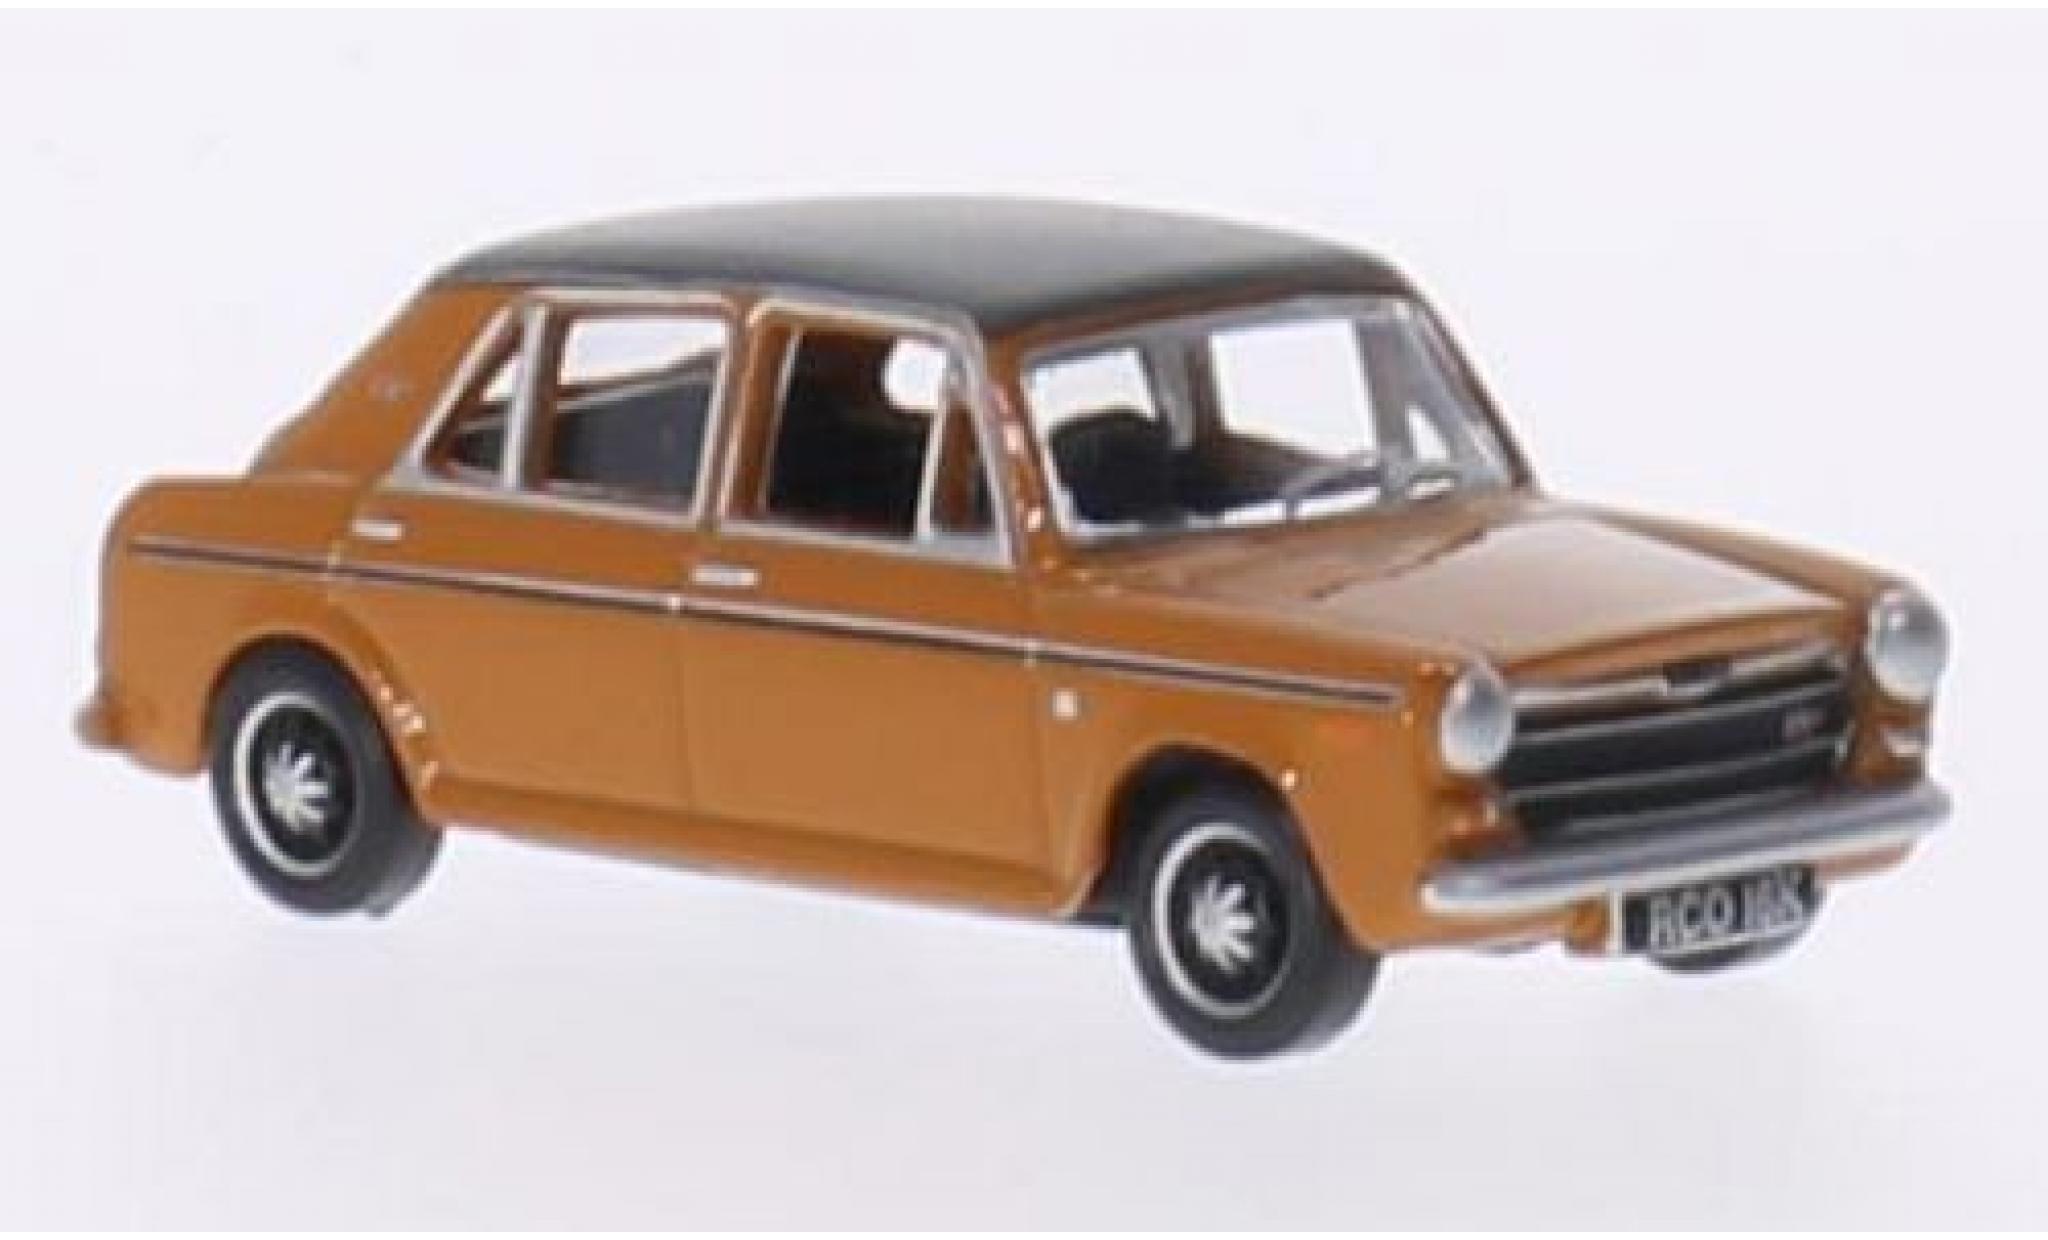 Austin 1300 1/76 Oxford marron/noire RHD